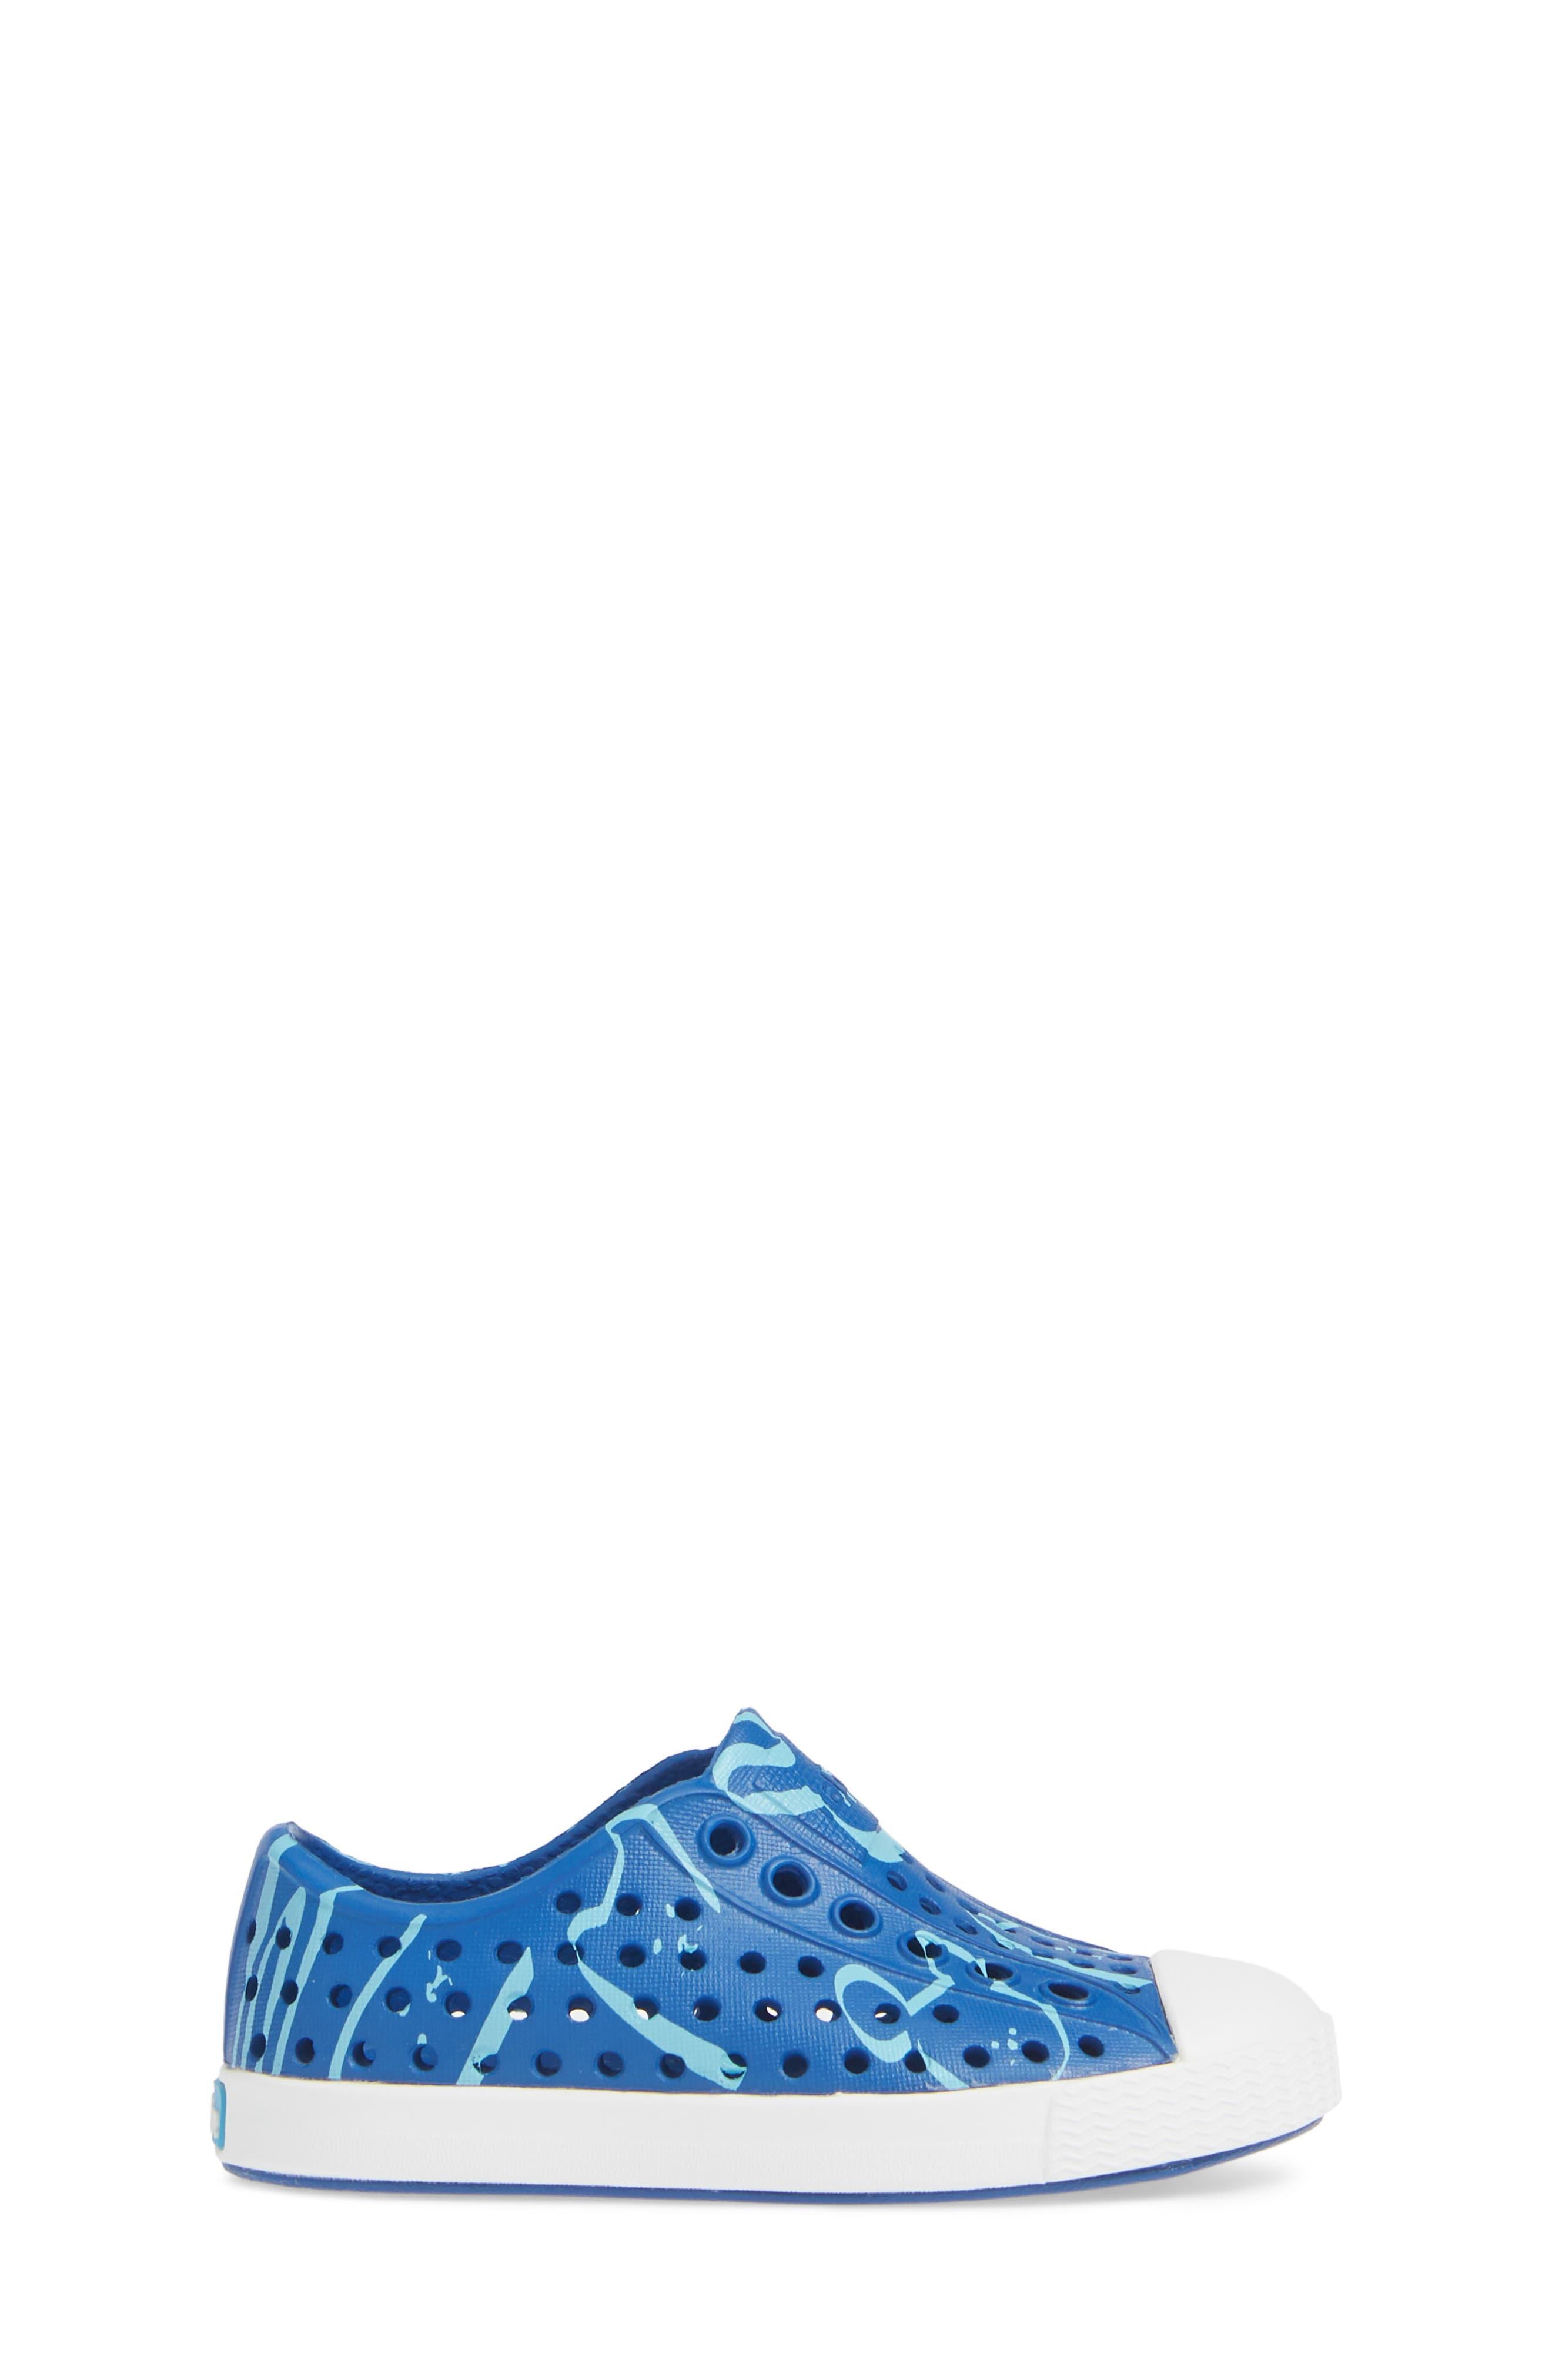 Jefferson Water Friendly Slip-On Shoe,                             Alternate thumbnail 3, color,                             VICTORIA BLUE/ WHITE ANIMALIA